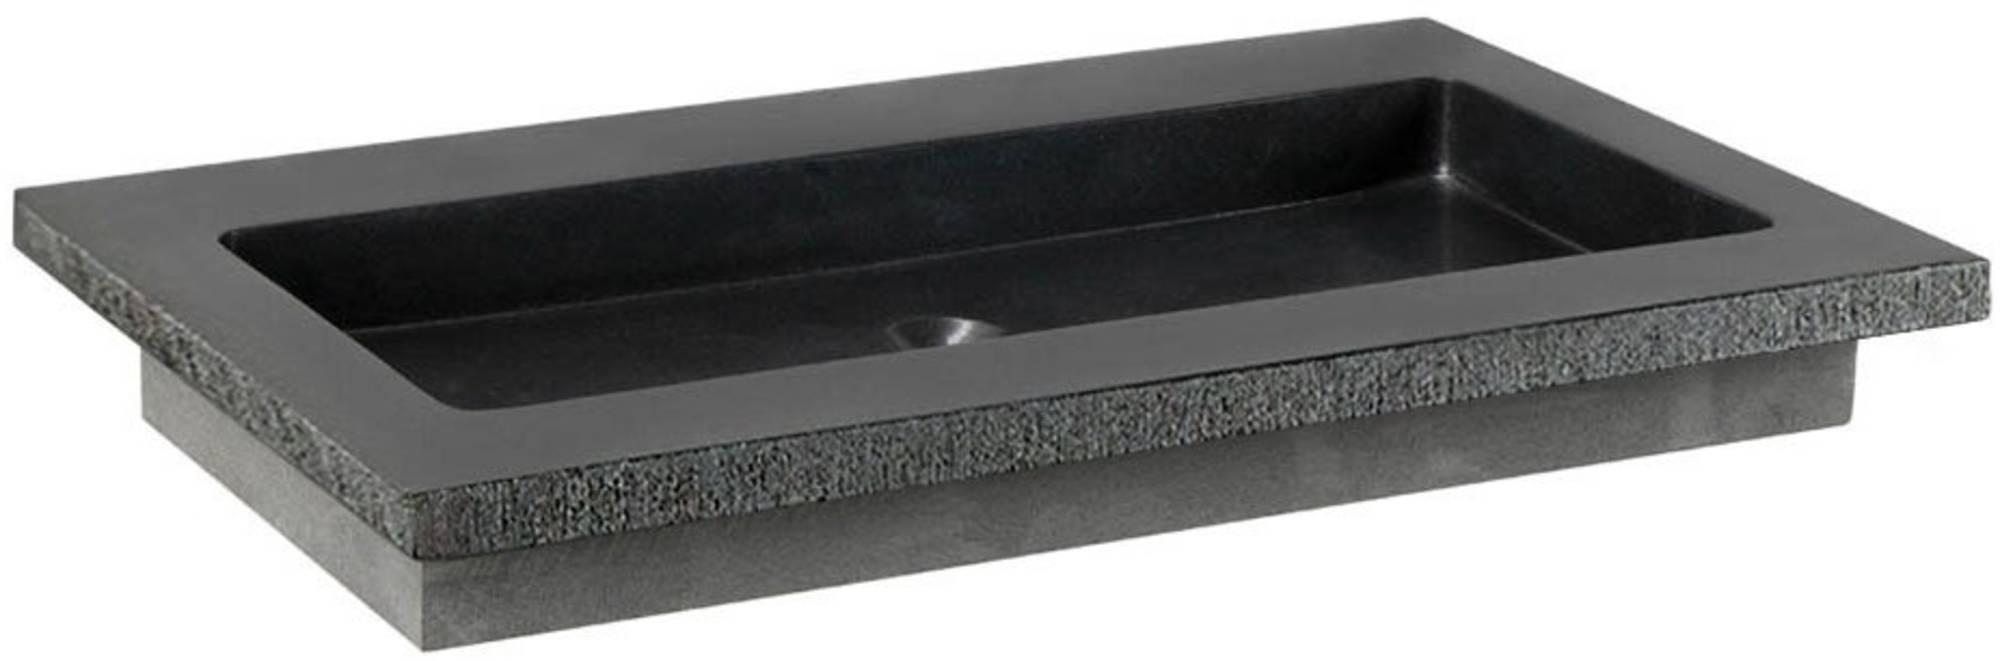 Ben Naturno Wastafel Graniet Gezoet Gefrijnd 60,5x51,5x3 cm zonder Krg. Zwart